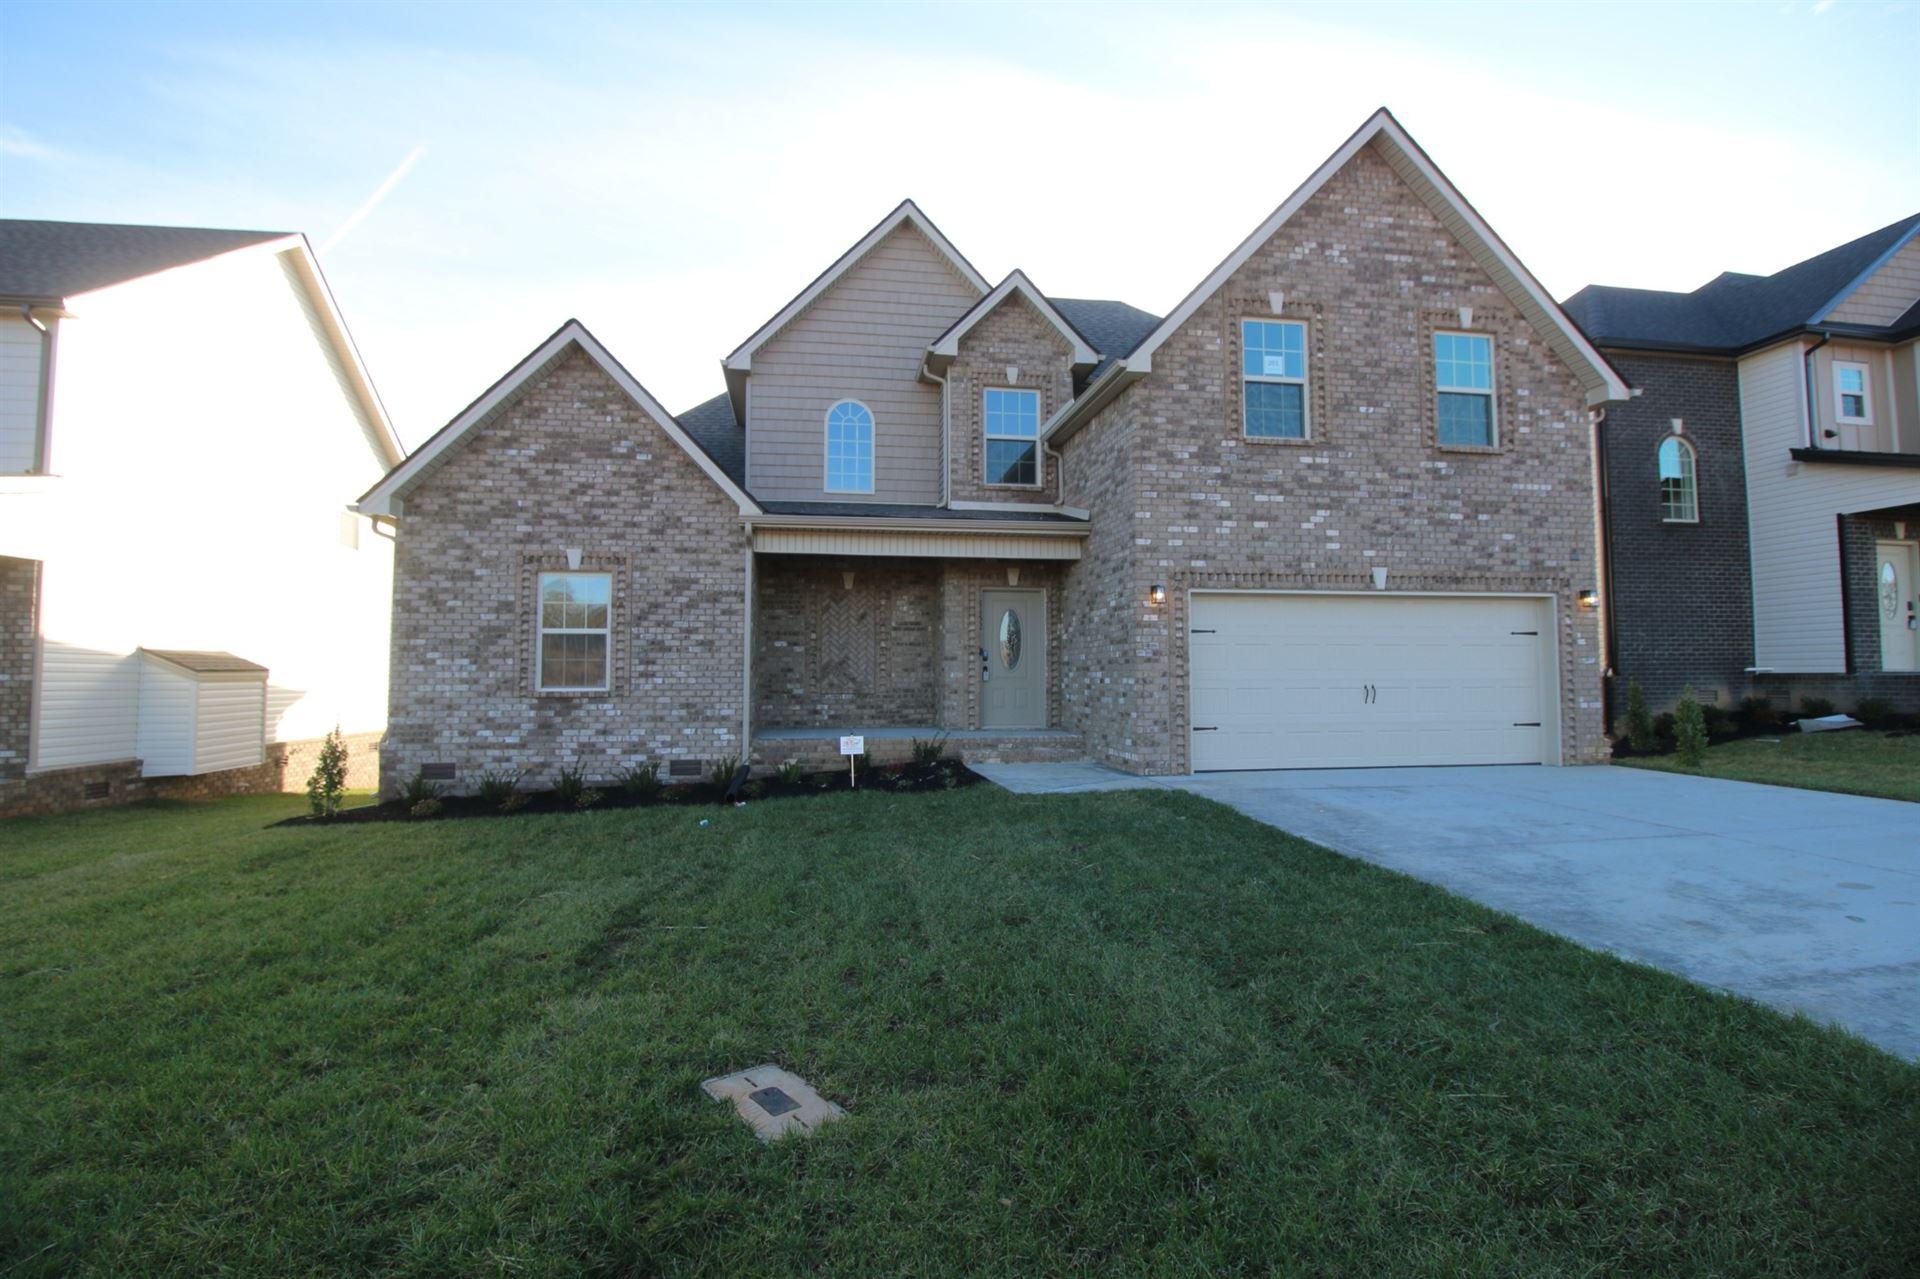 201 Charleston Oaks Reserves, Clarksville, TN 37042 - MLS#: 2291559